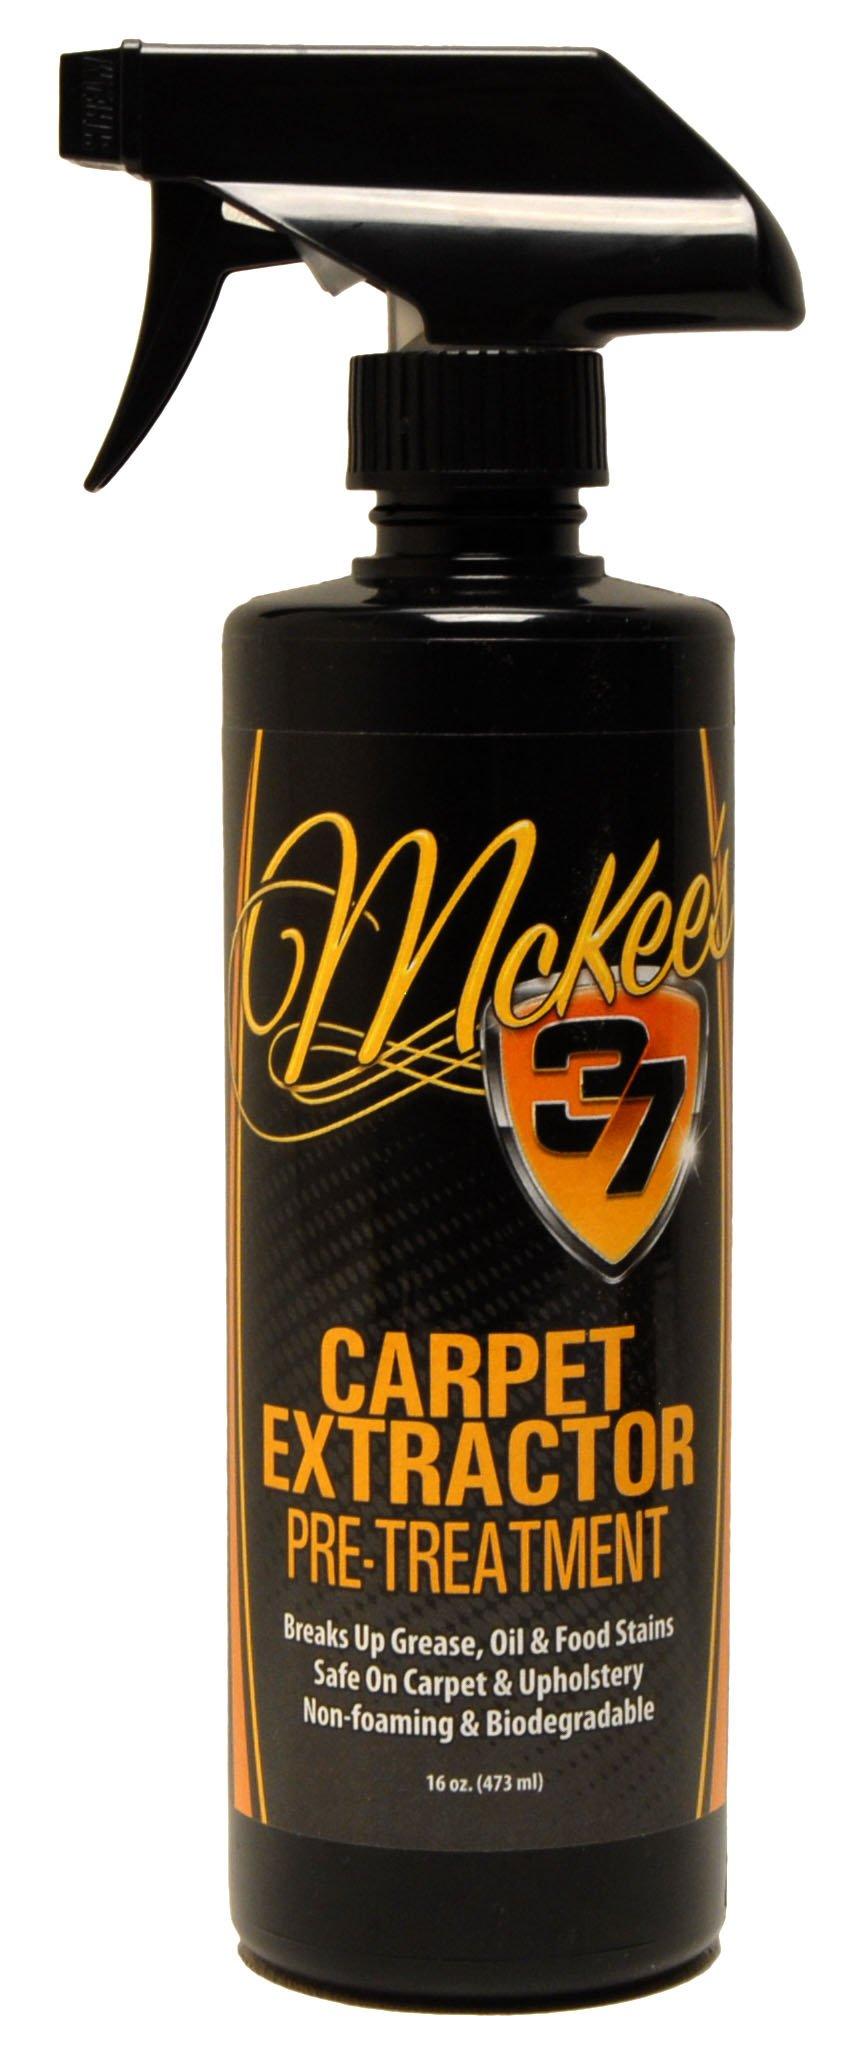 McKee's 37 MK37-390 Carpet Extractor Pre-Treatment, 16 fl. oz.